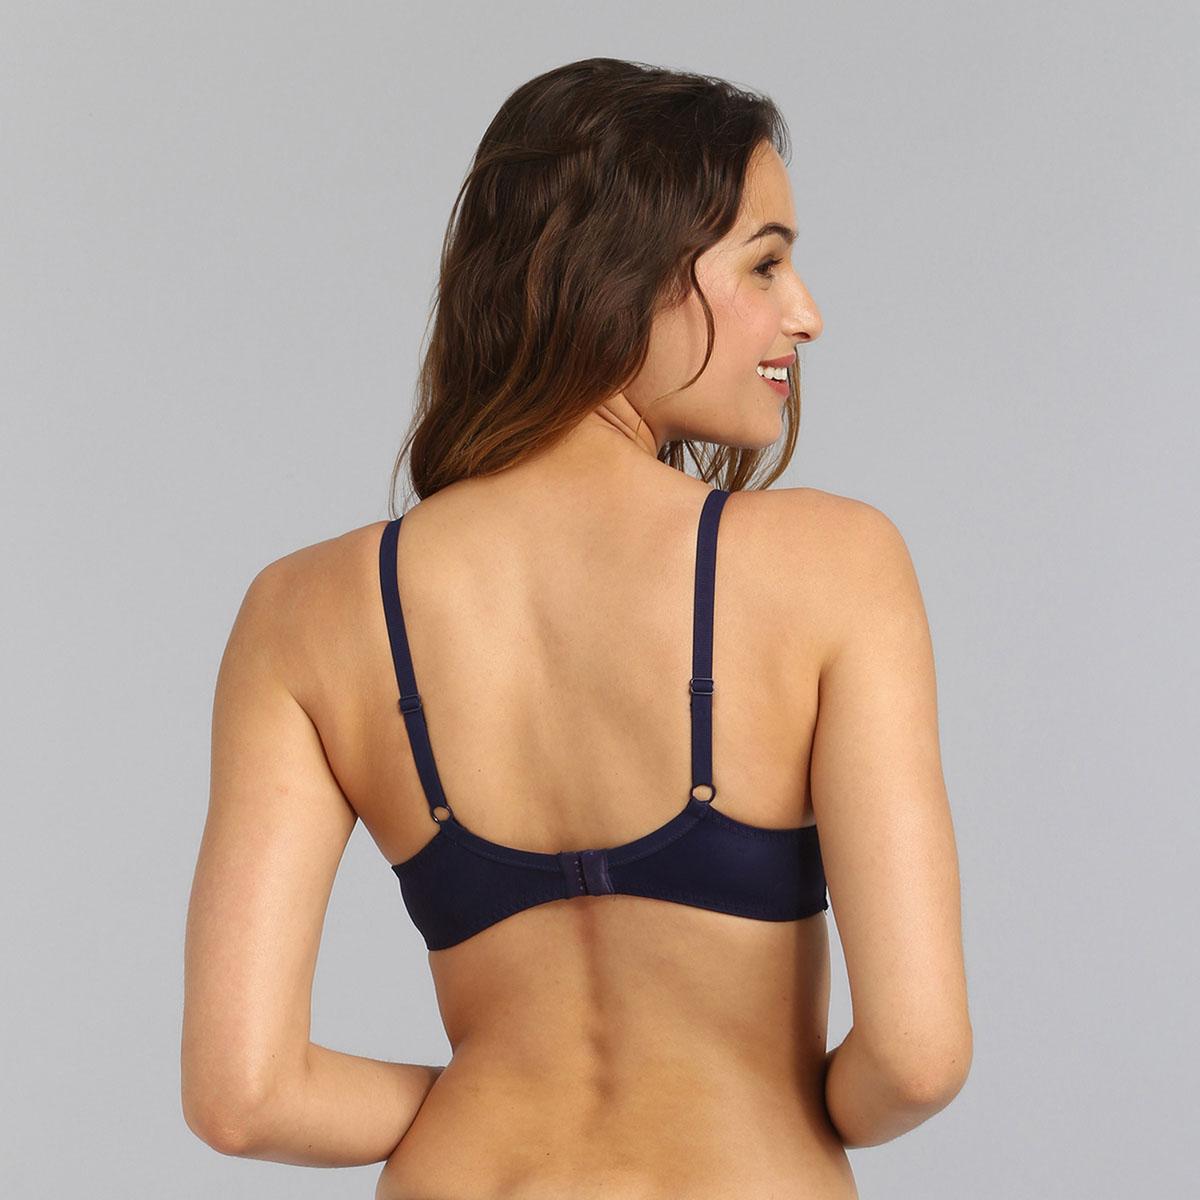 Reggiseno con ferretto blu marino Essential Elegance Embroidery, , PLAYTEX